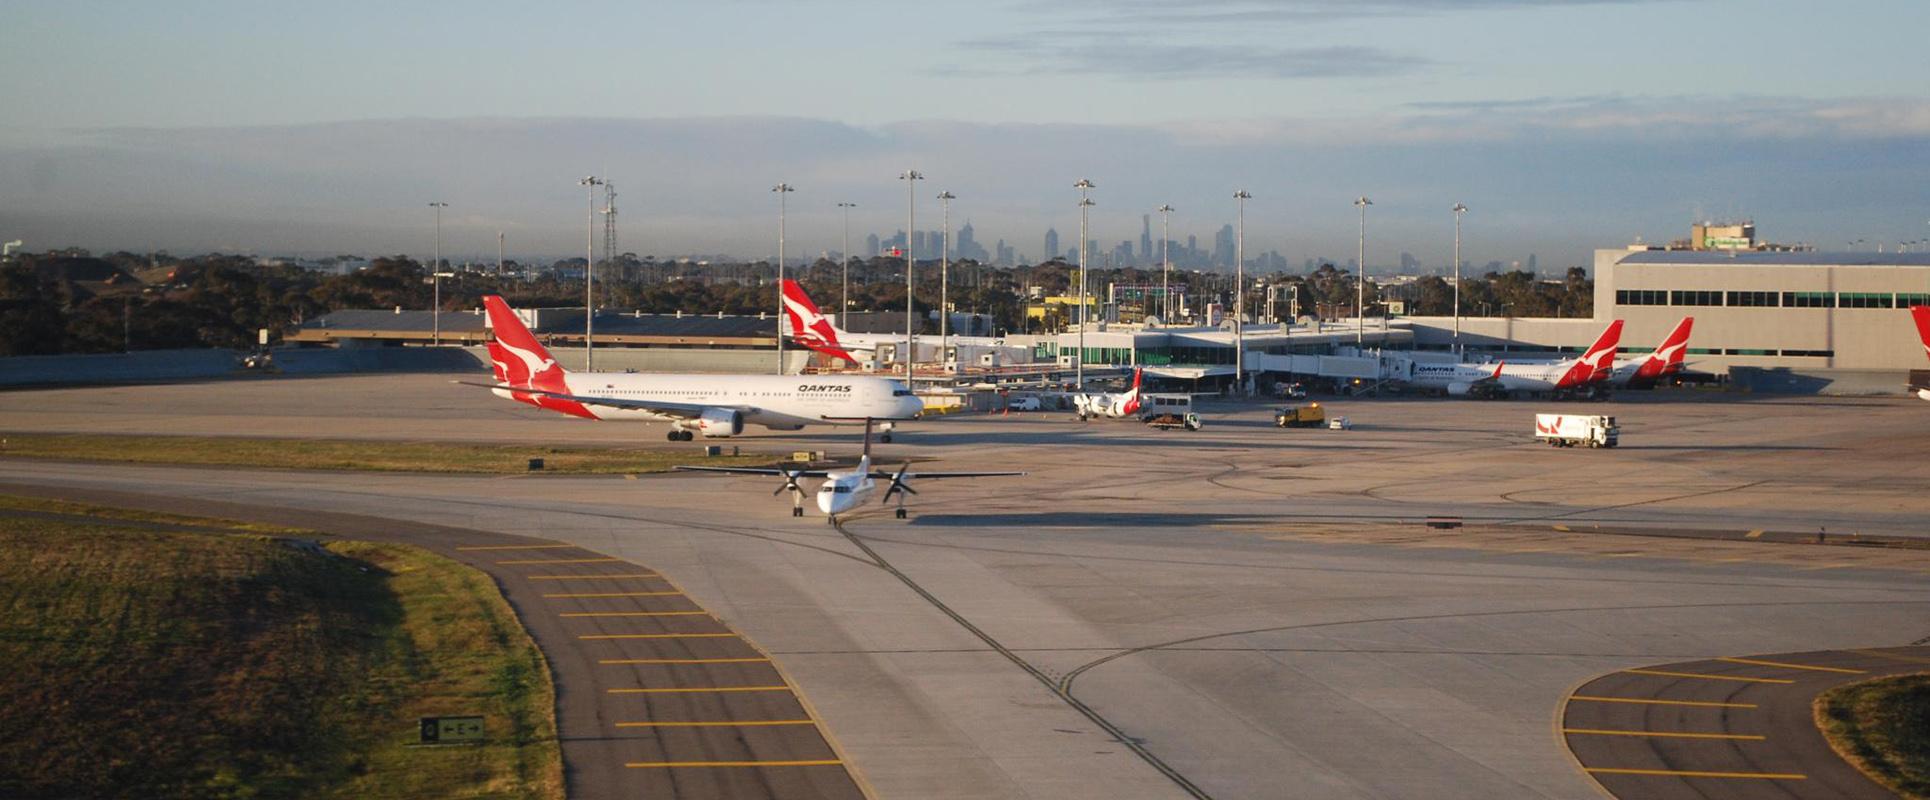 Slab Jacking at Airport Runways by CPR Australia